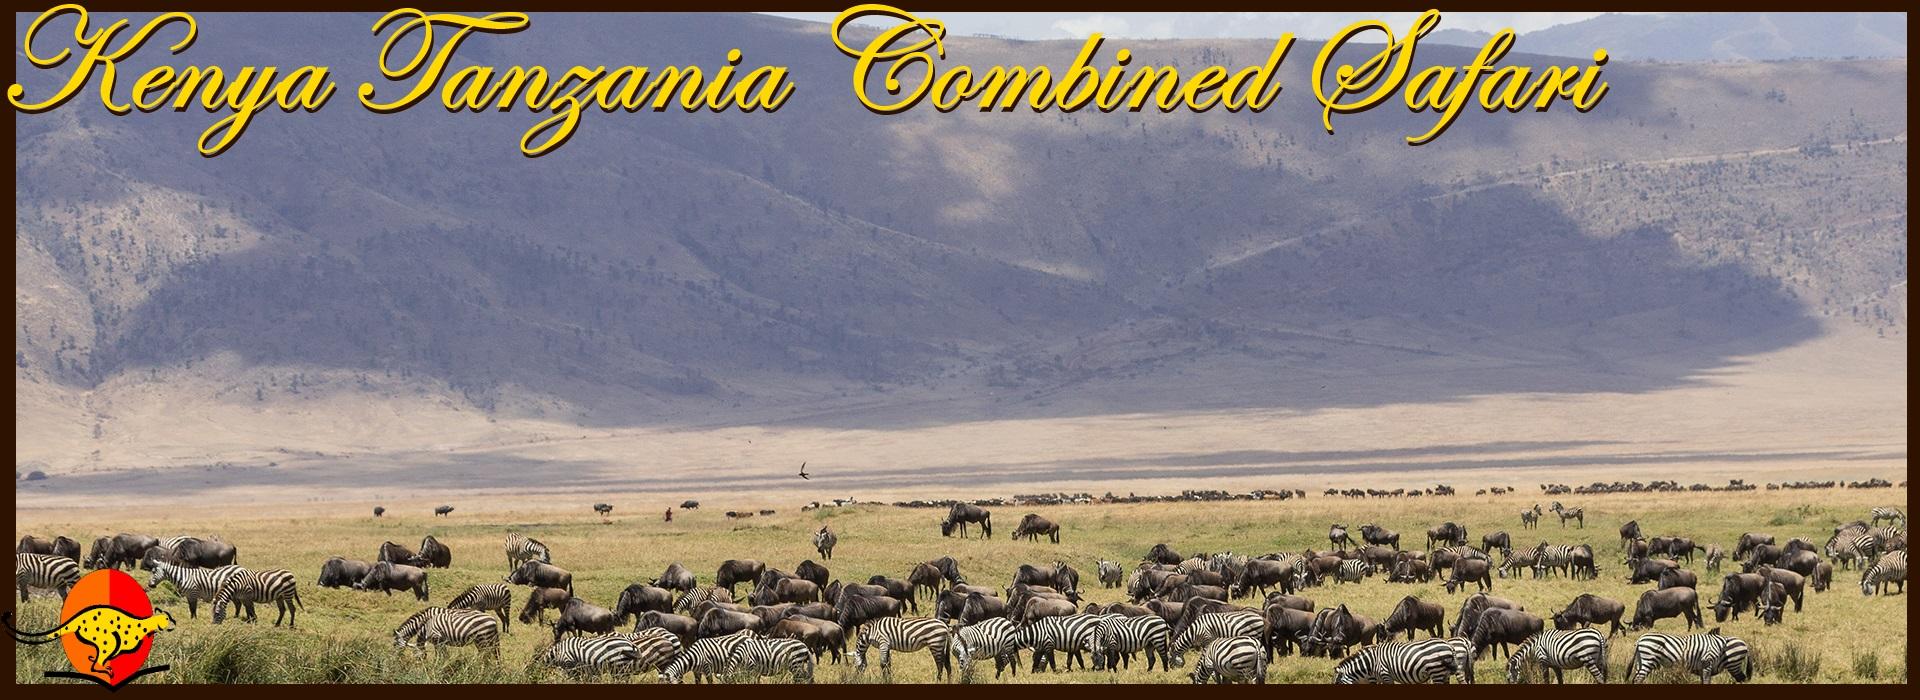 Kenya Tanzania Safari Ngorongoro Crater Safari Holidays